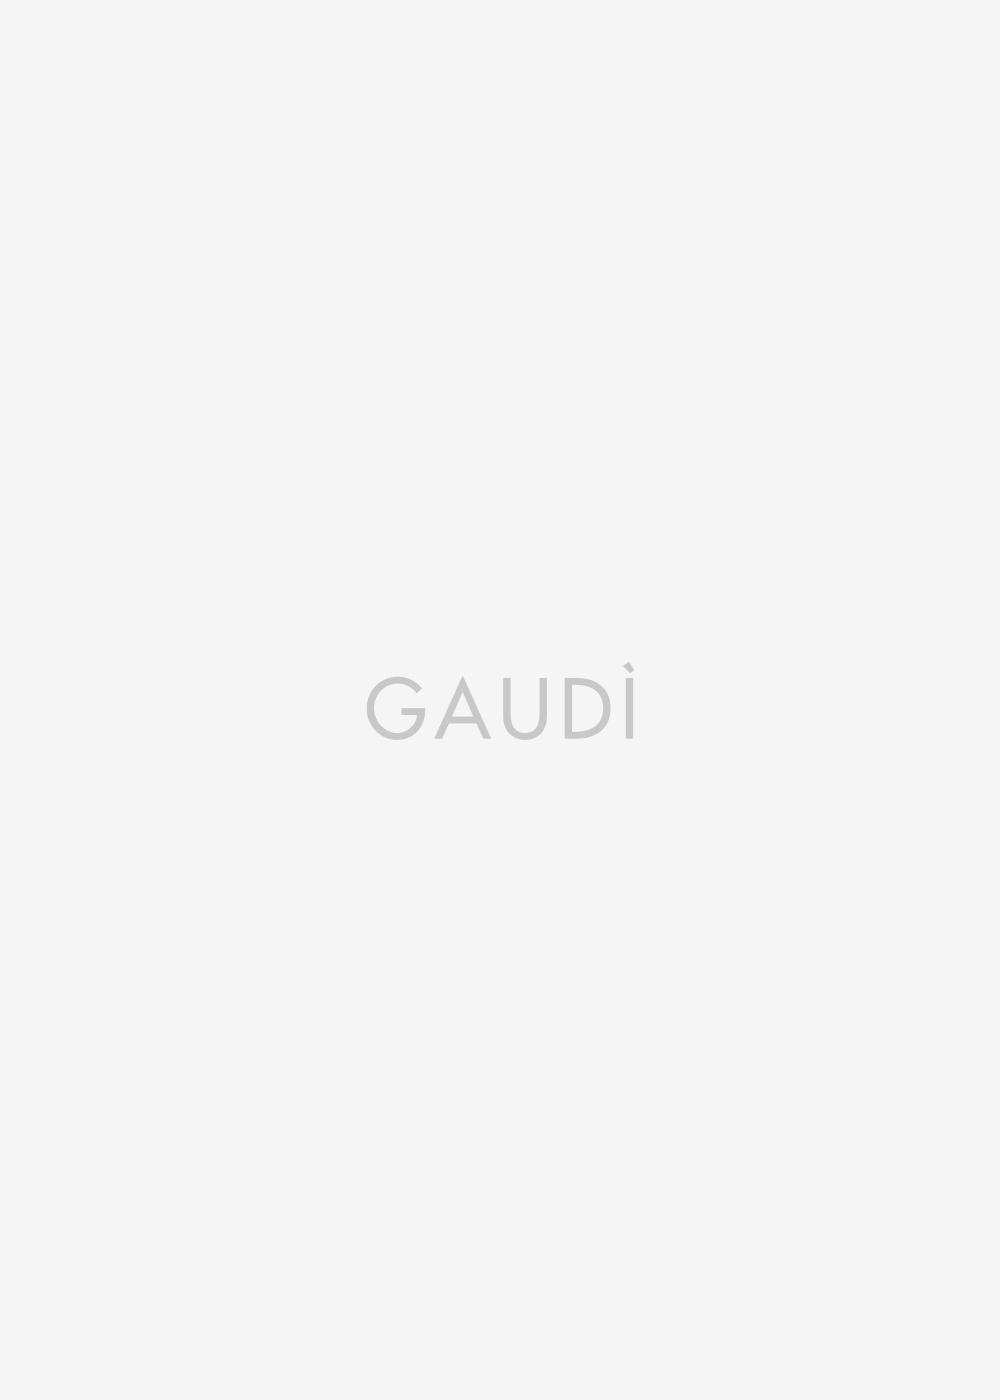 Down Jacket Jacket Long Sleeve